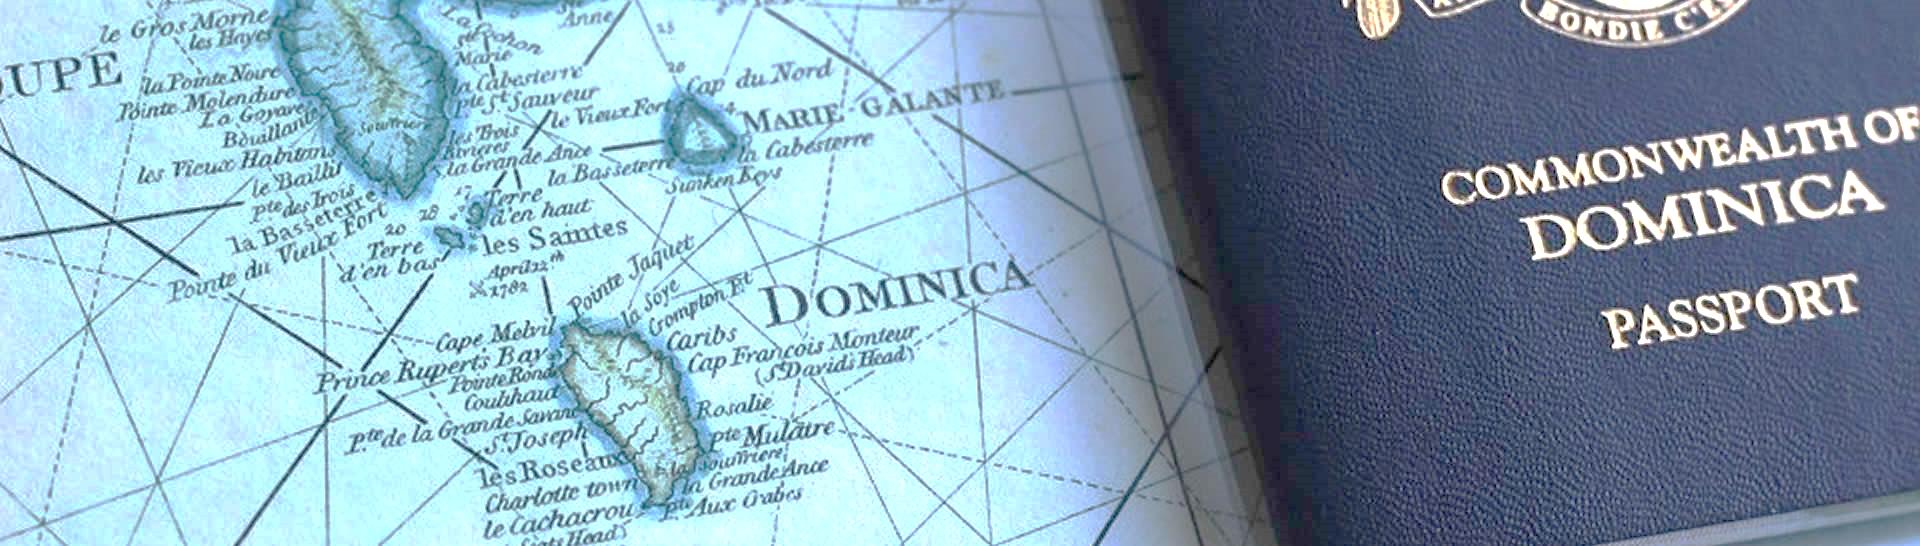 Citizenship Program in Commonwealth of Dominica